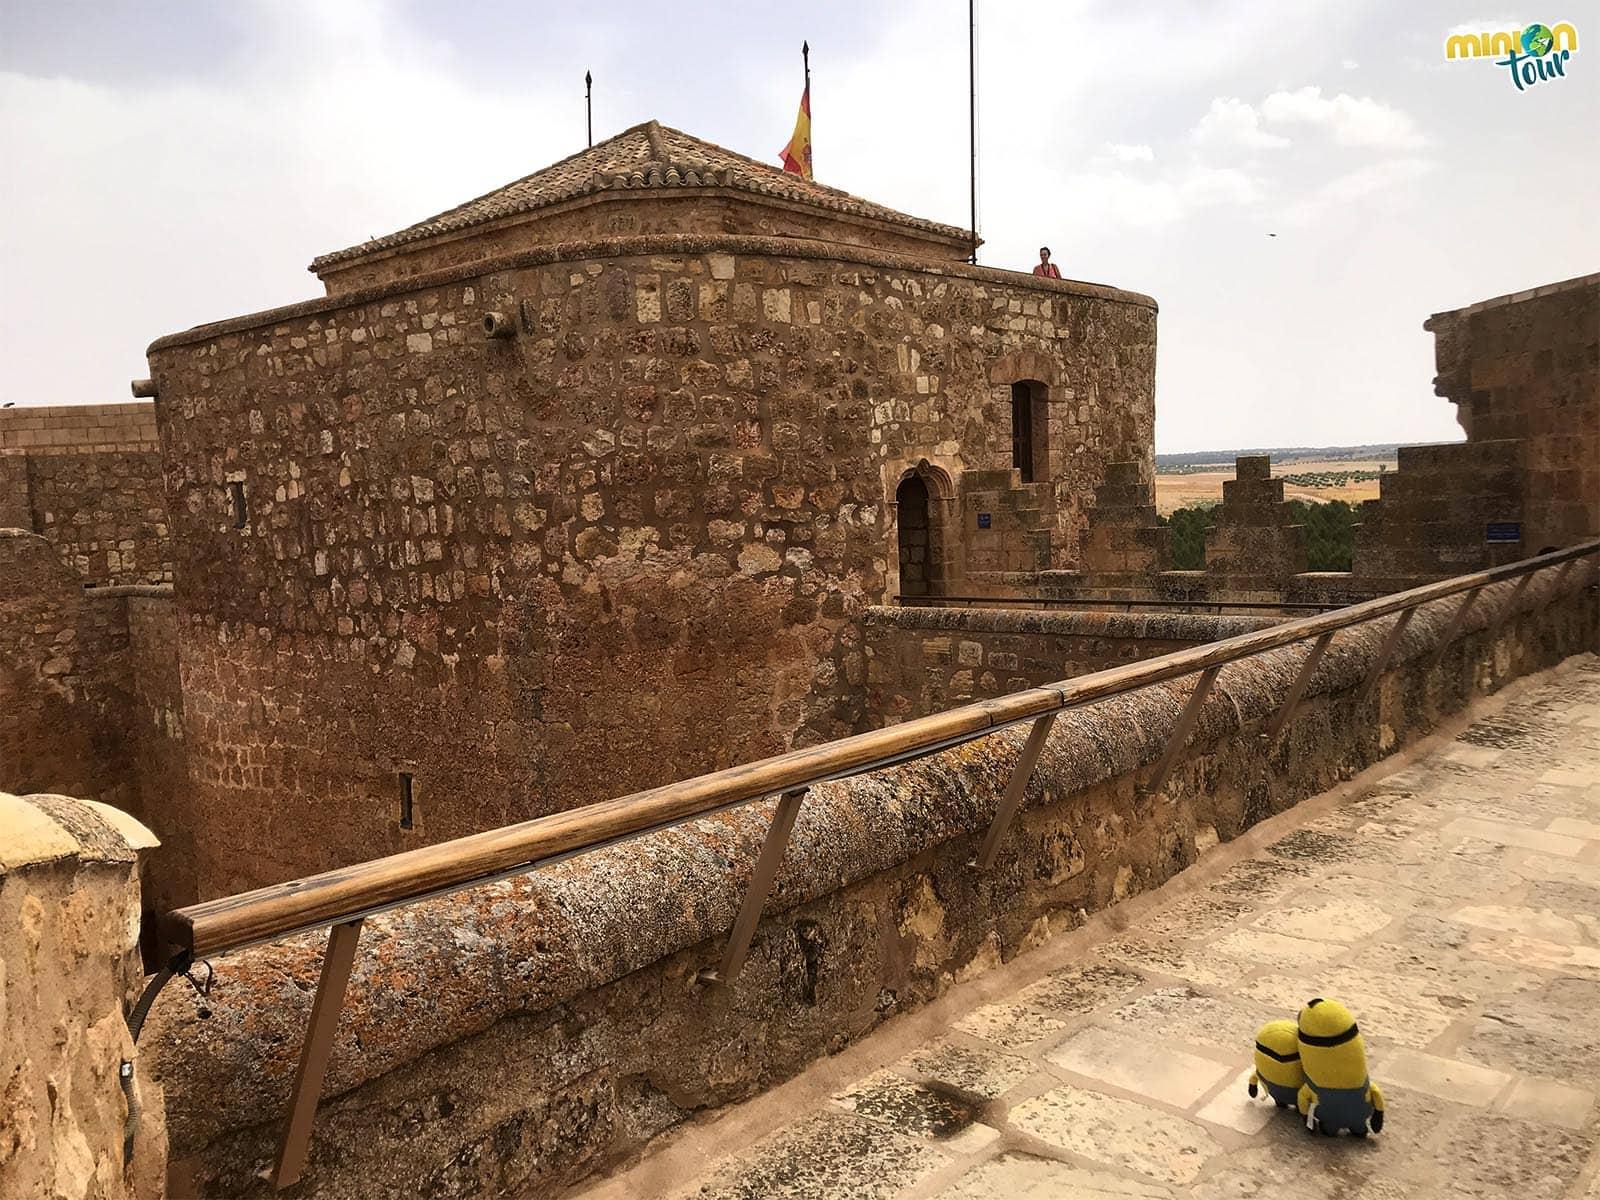 Torre del Homenaje del Castillo de Belmonte